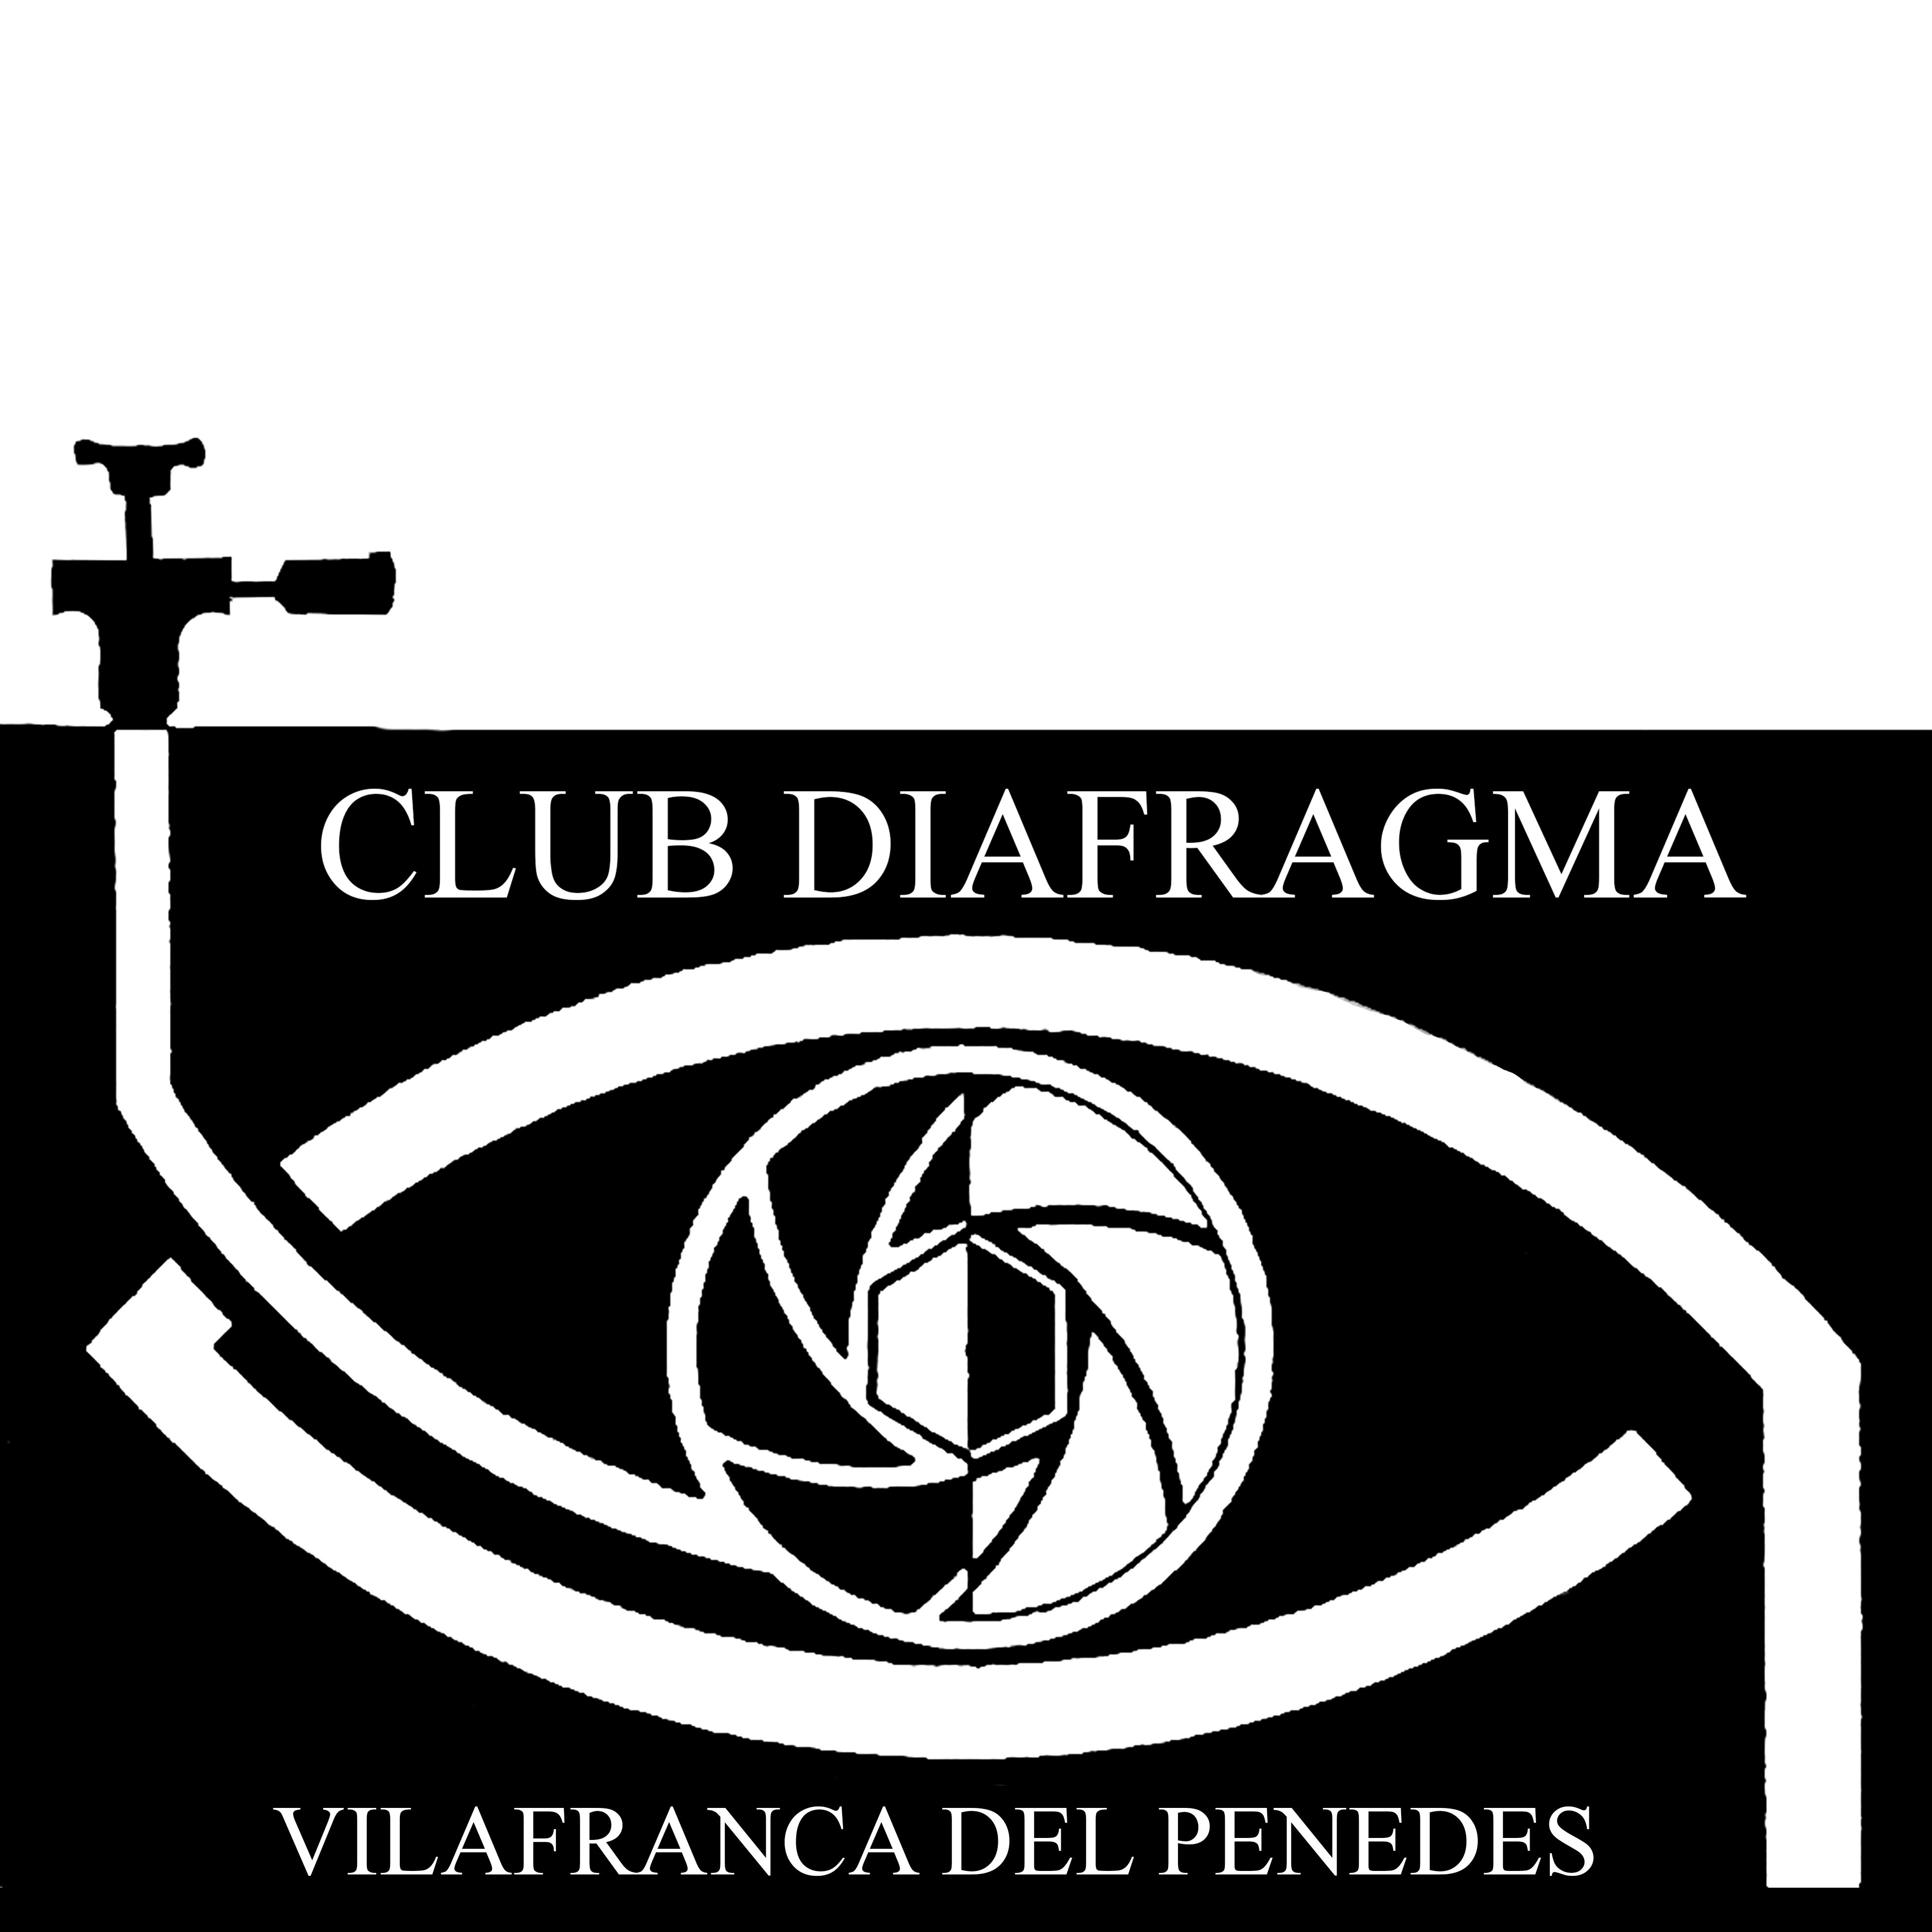 CLUB DIAFRAGMA VILAFRANCA